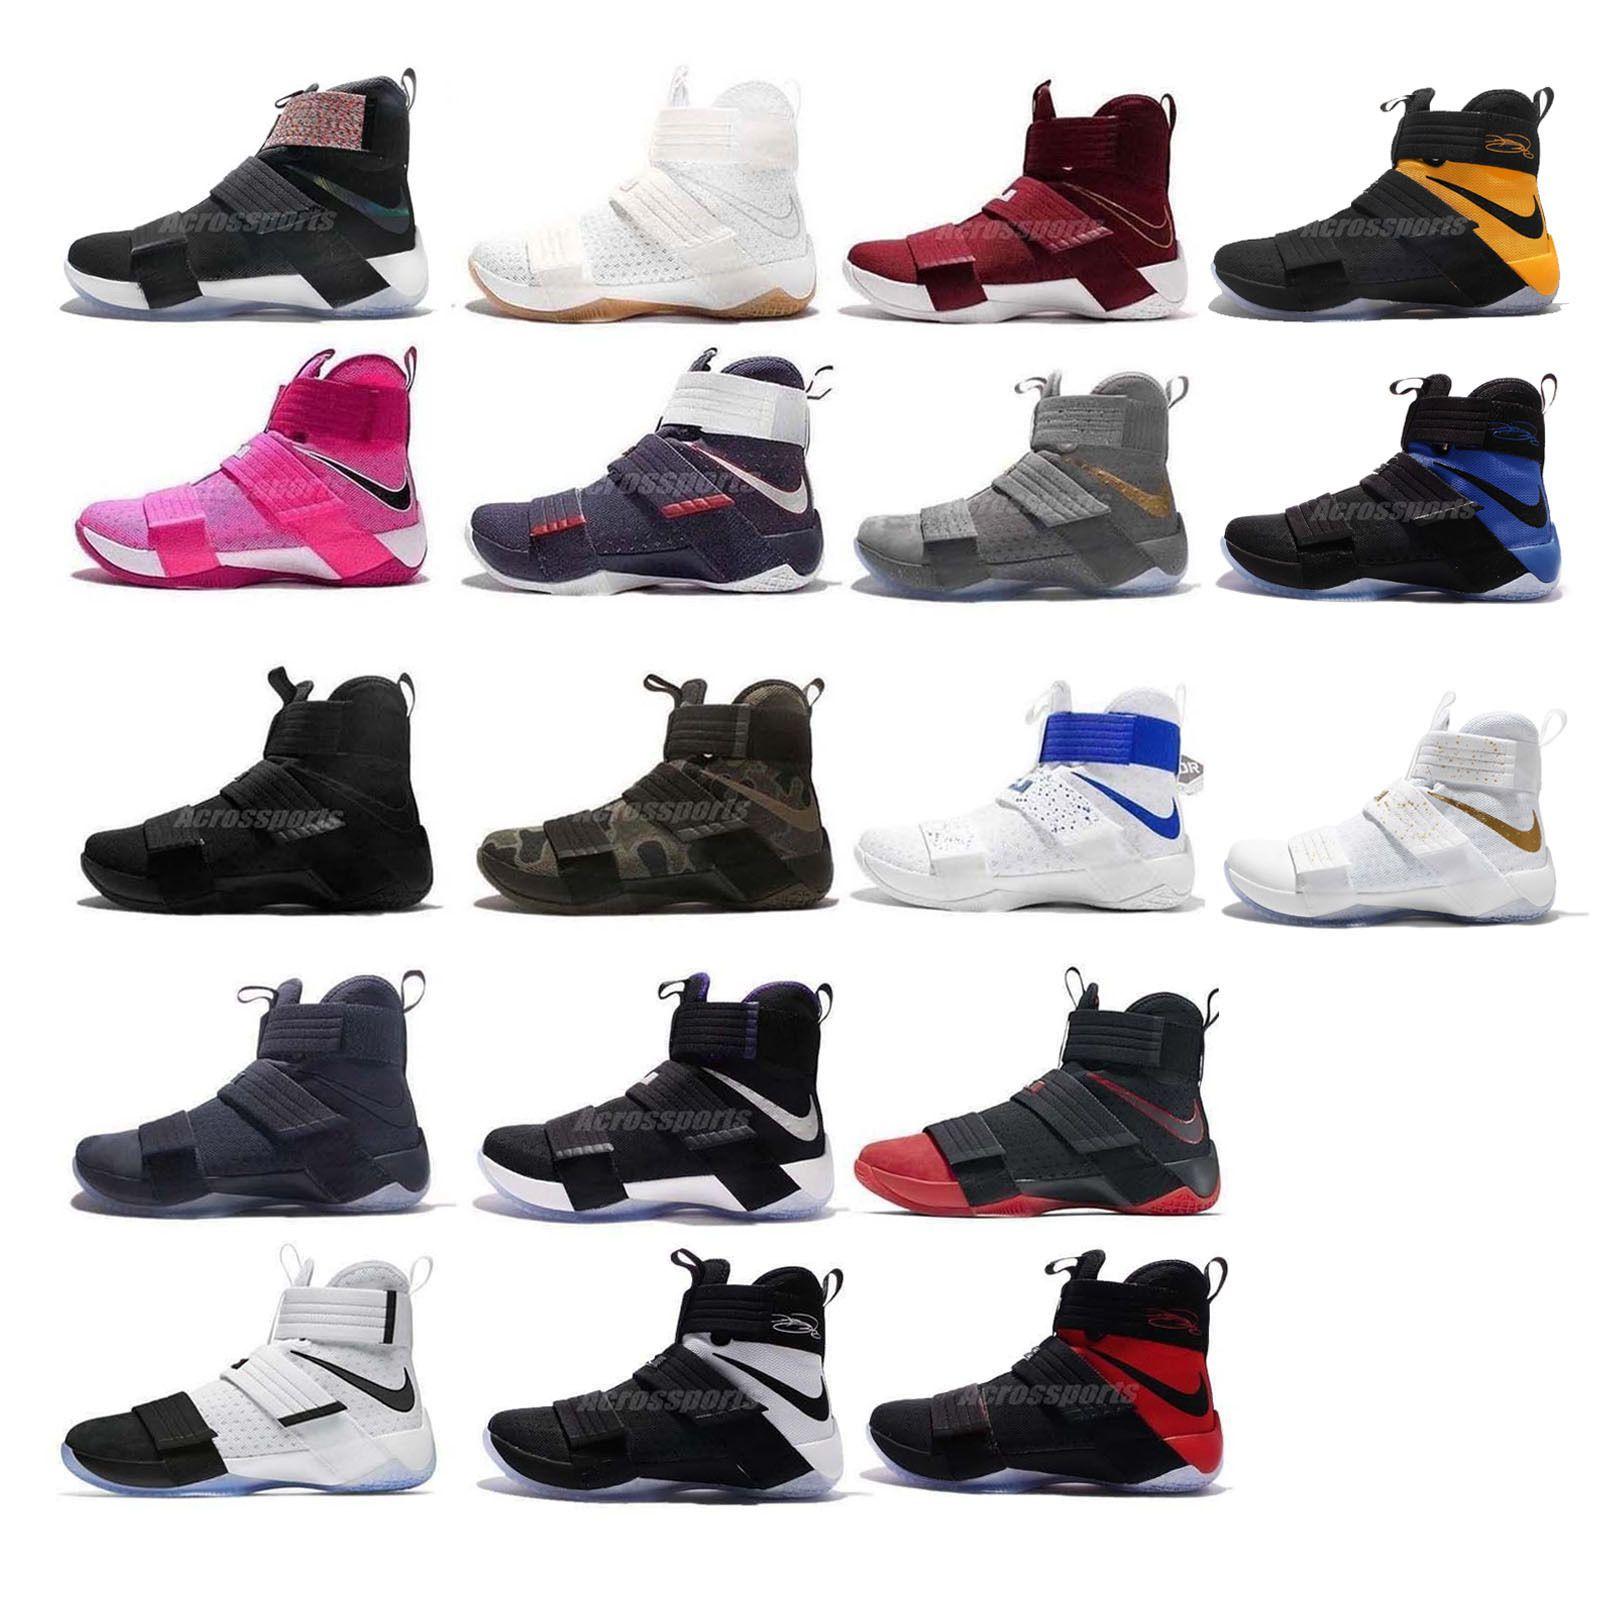 Nike Lebron Soldier 10 SFG EP X James